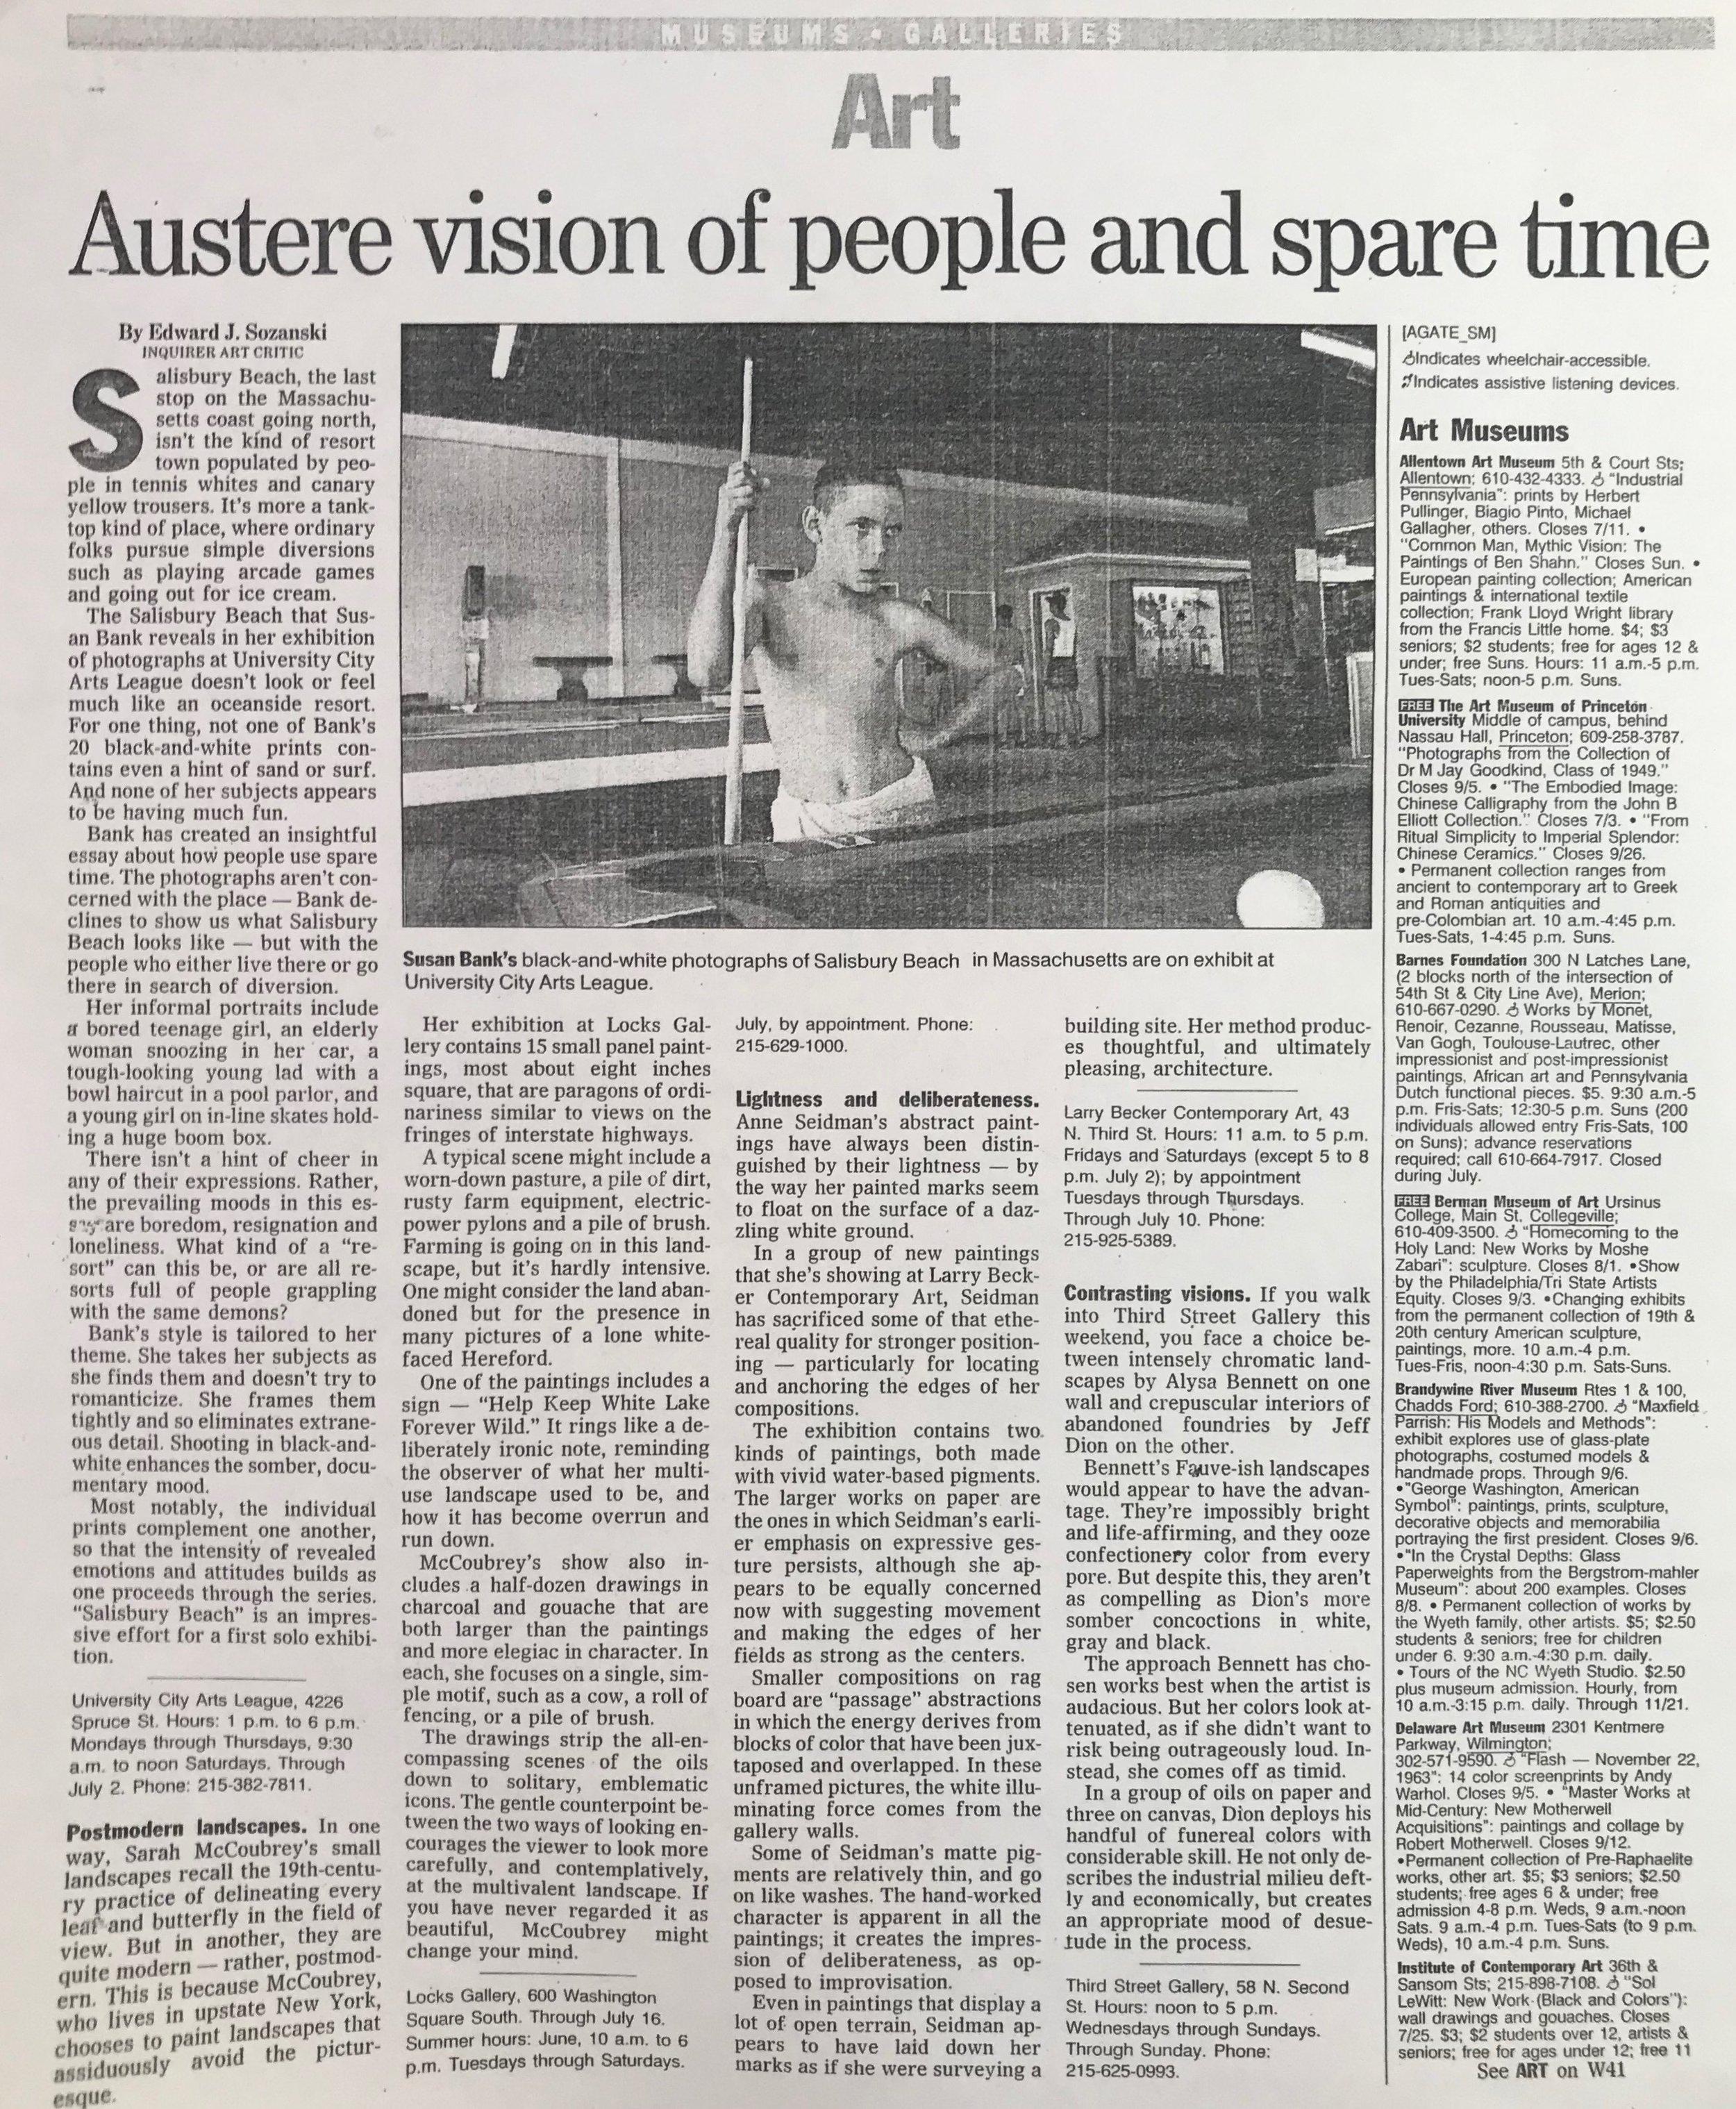 Contrasting Visions The Philadelphia Inquirer Edward Sozanski 1998